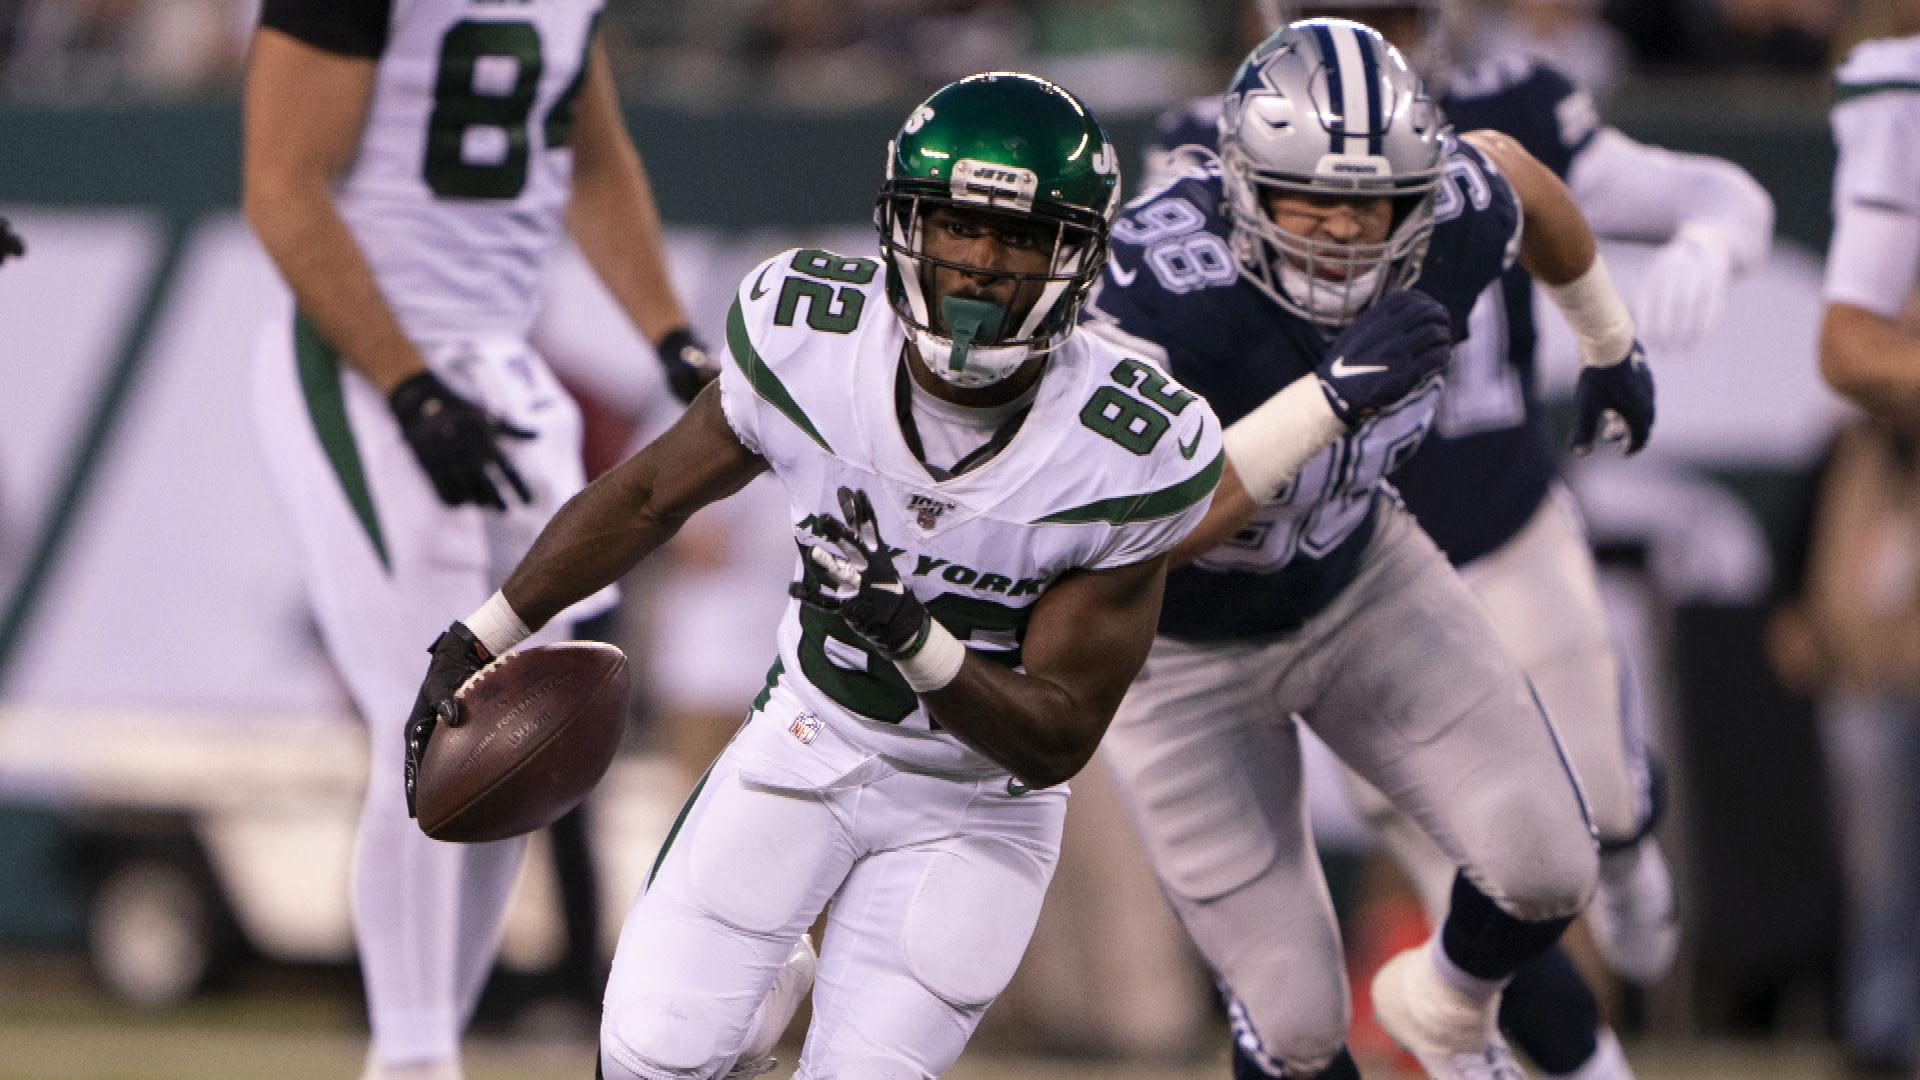 Jets' Sam Darnold ignites the value of Jamison Crowder in fantasy